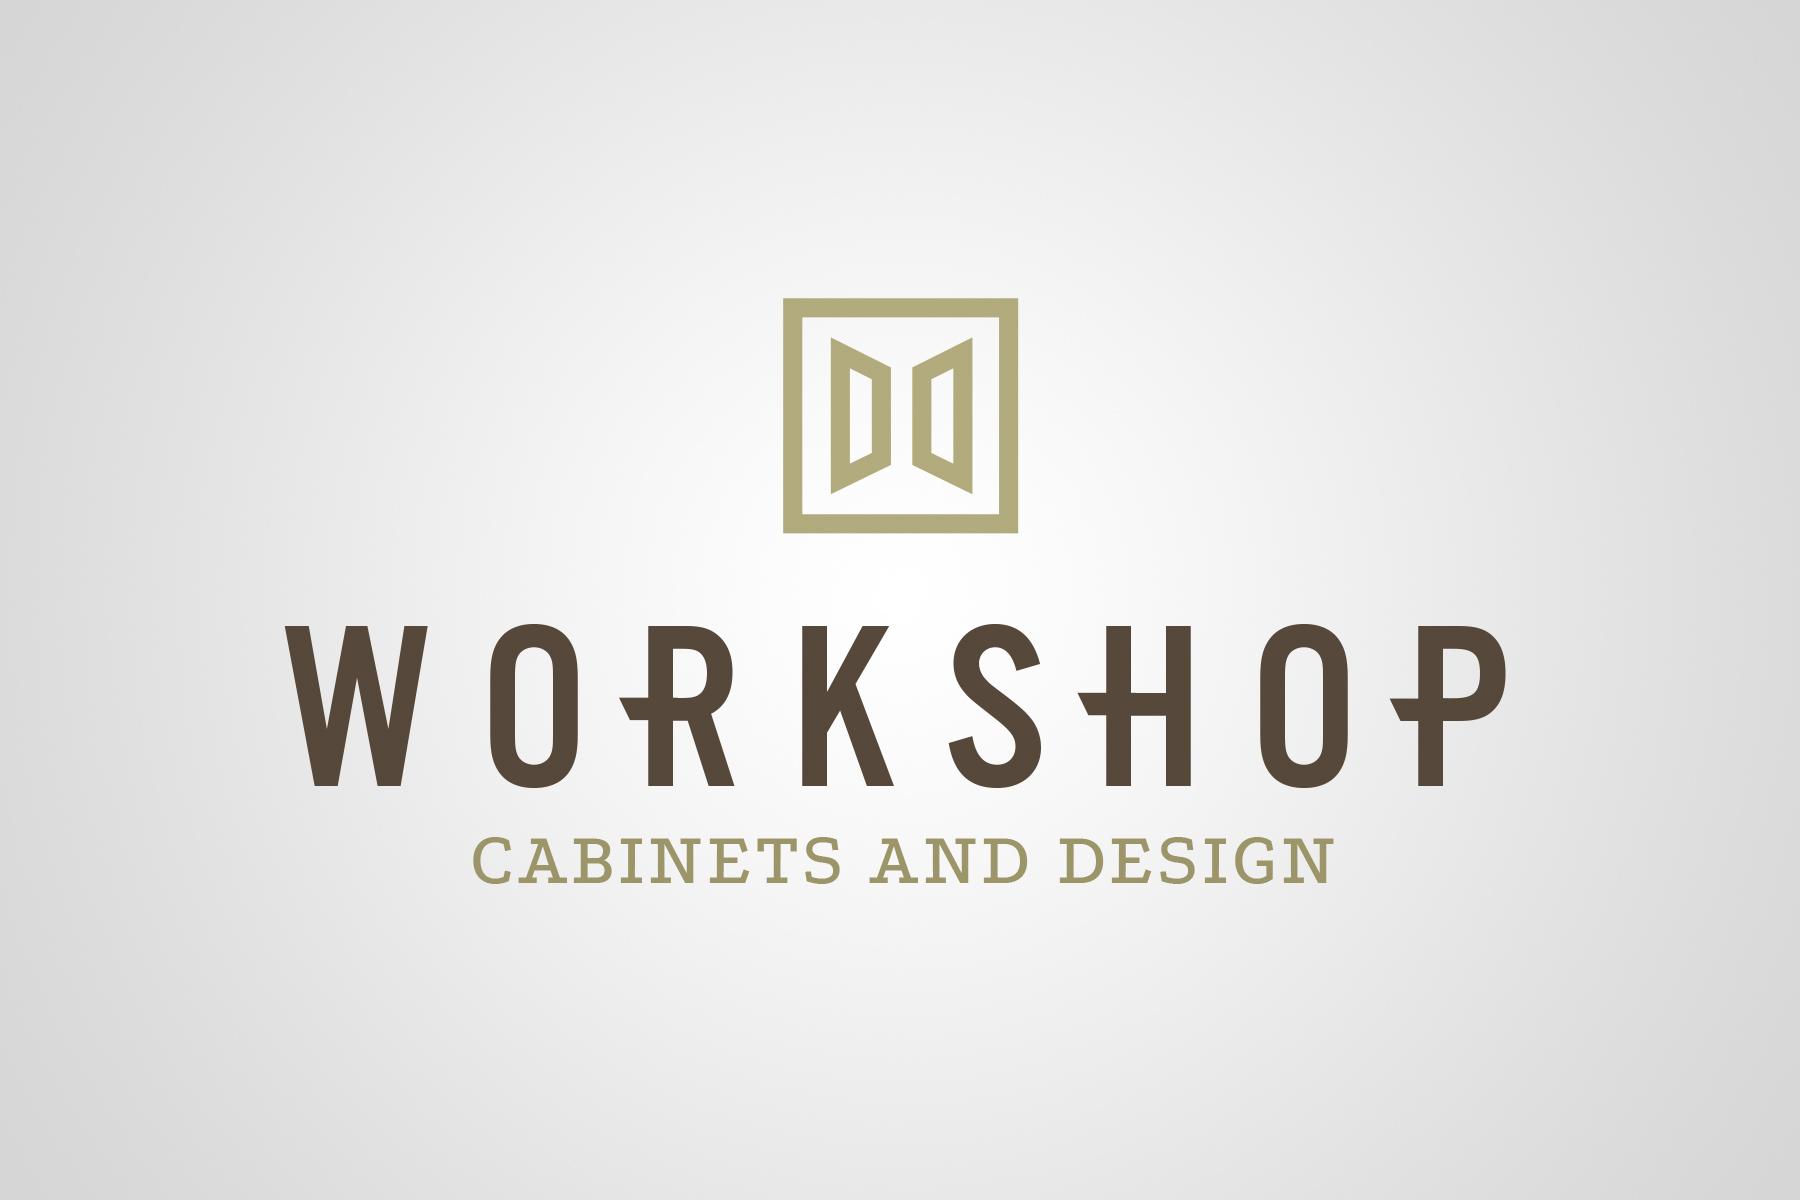 Workshop-Logos2.jpg